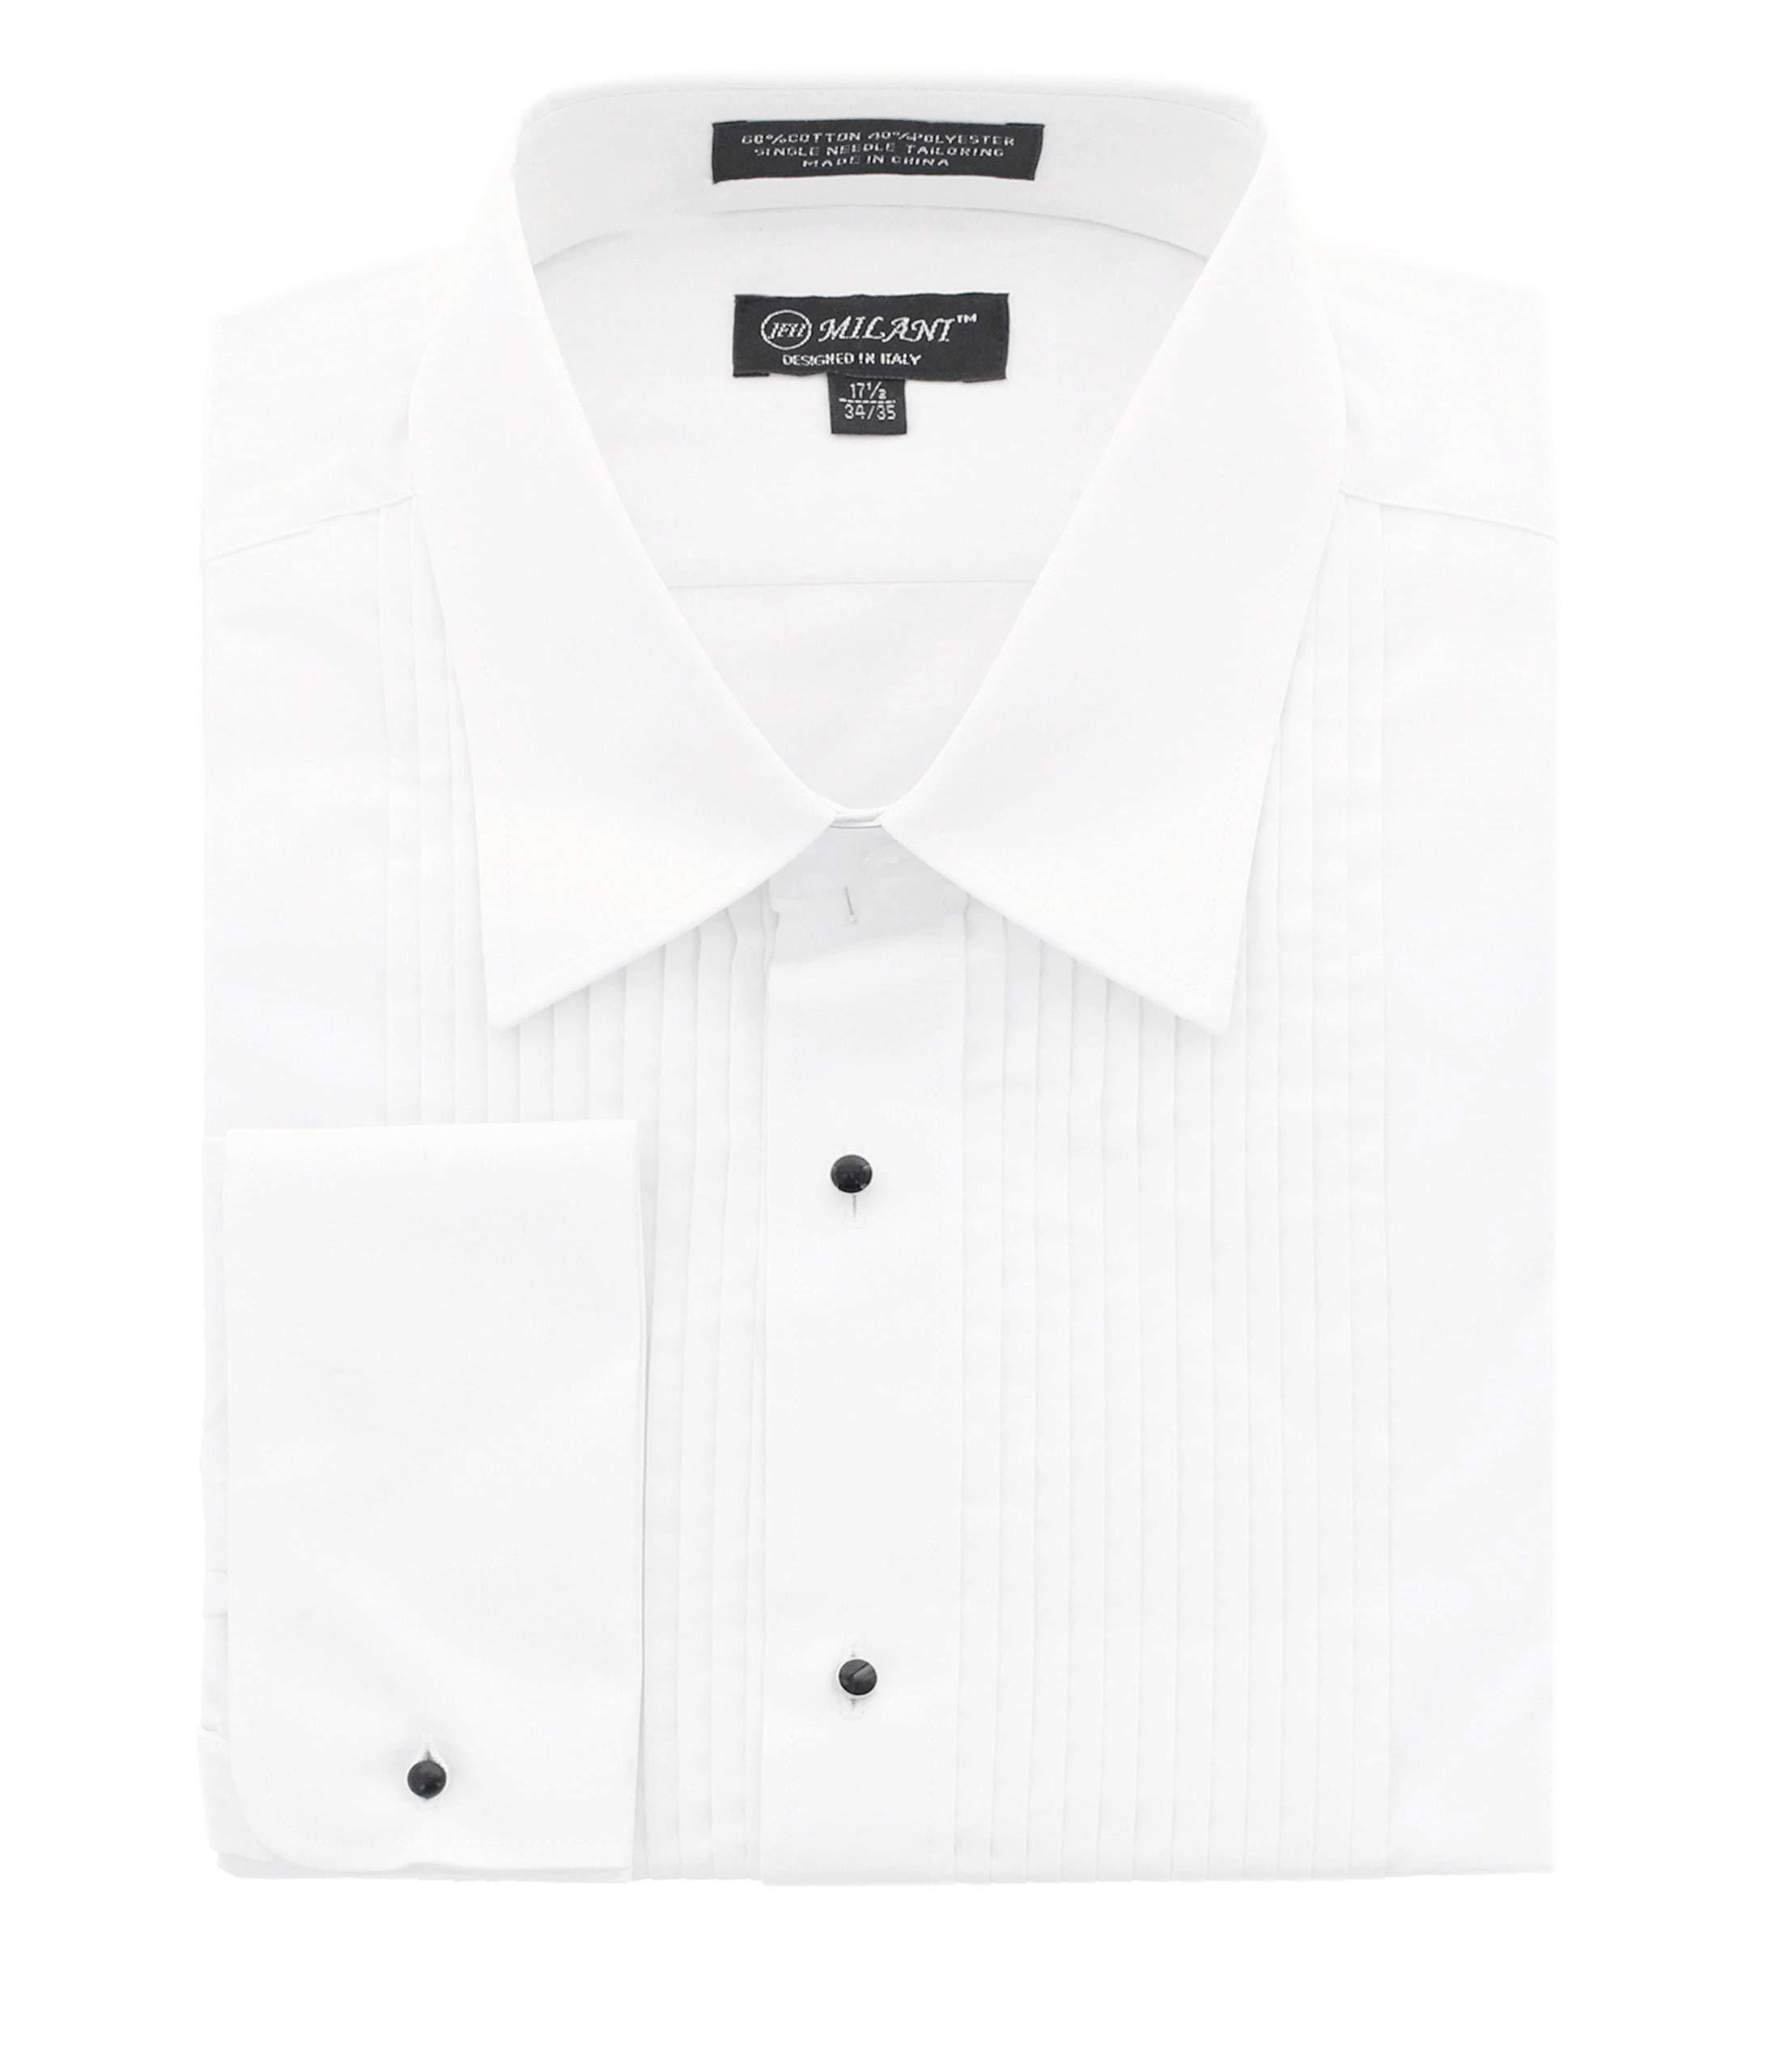 Milani Men's Tuxedo Shirt with French Cuffs 16'', 34/35 White by Milani